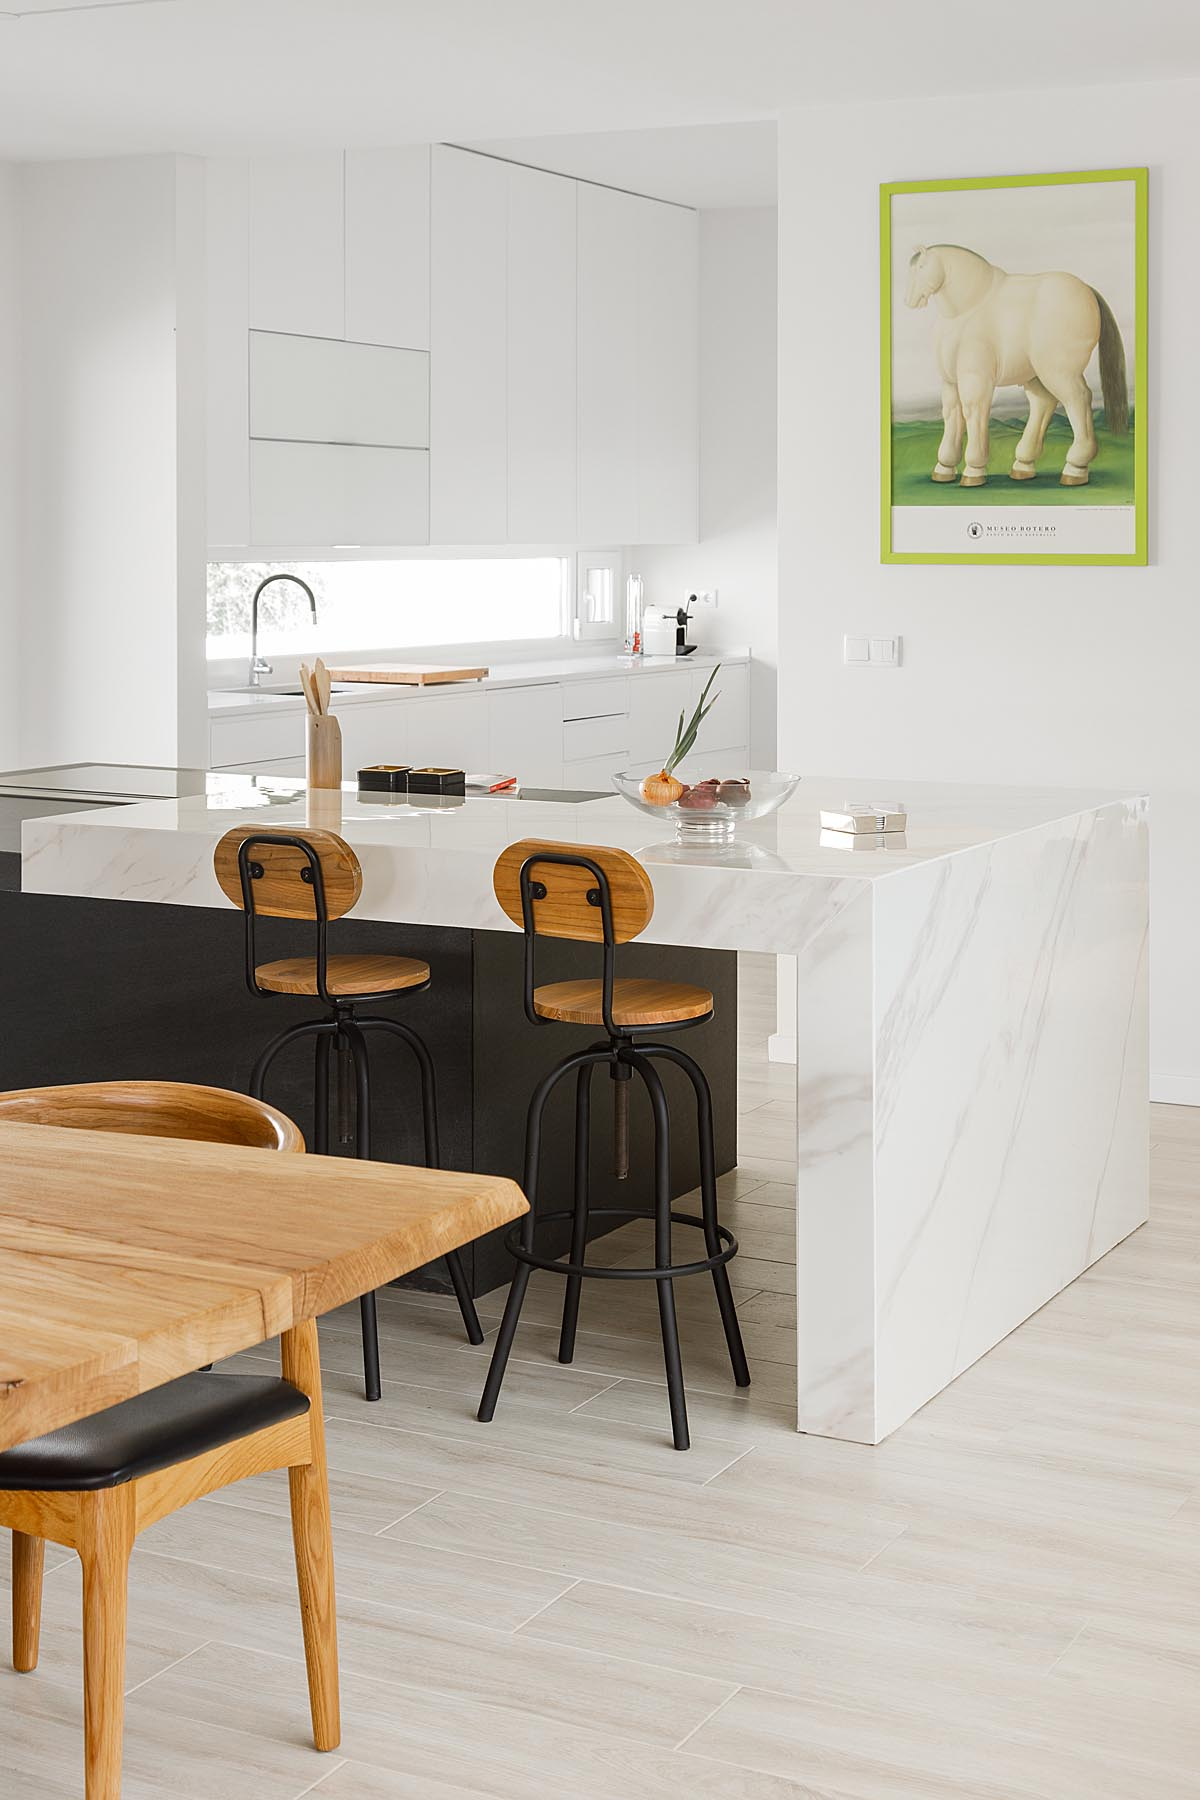 Moradia by Rui Arez - cozinha -  Linea Prestige